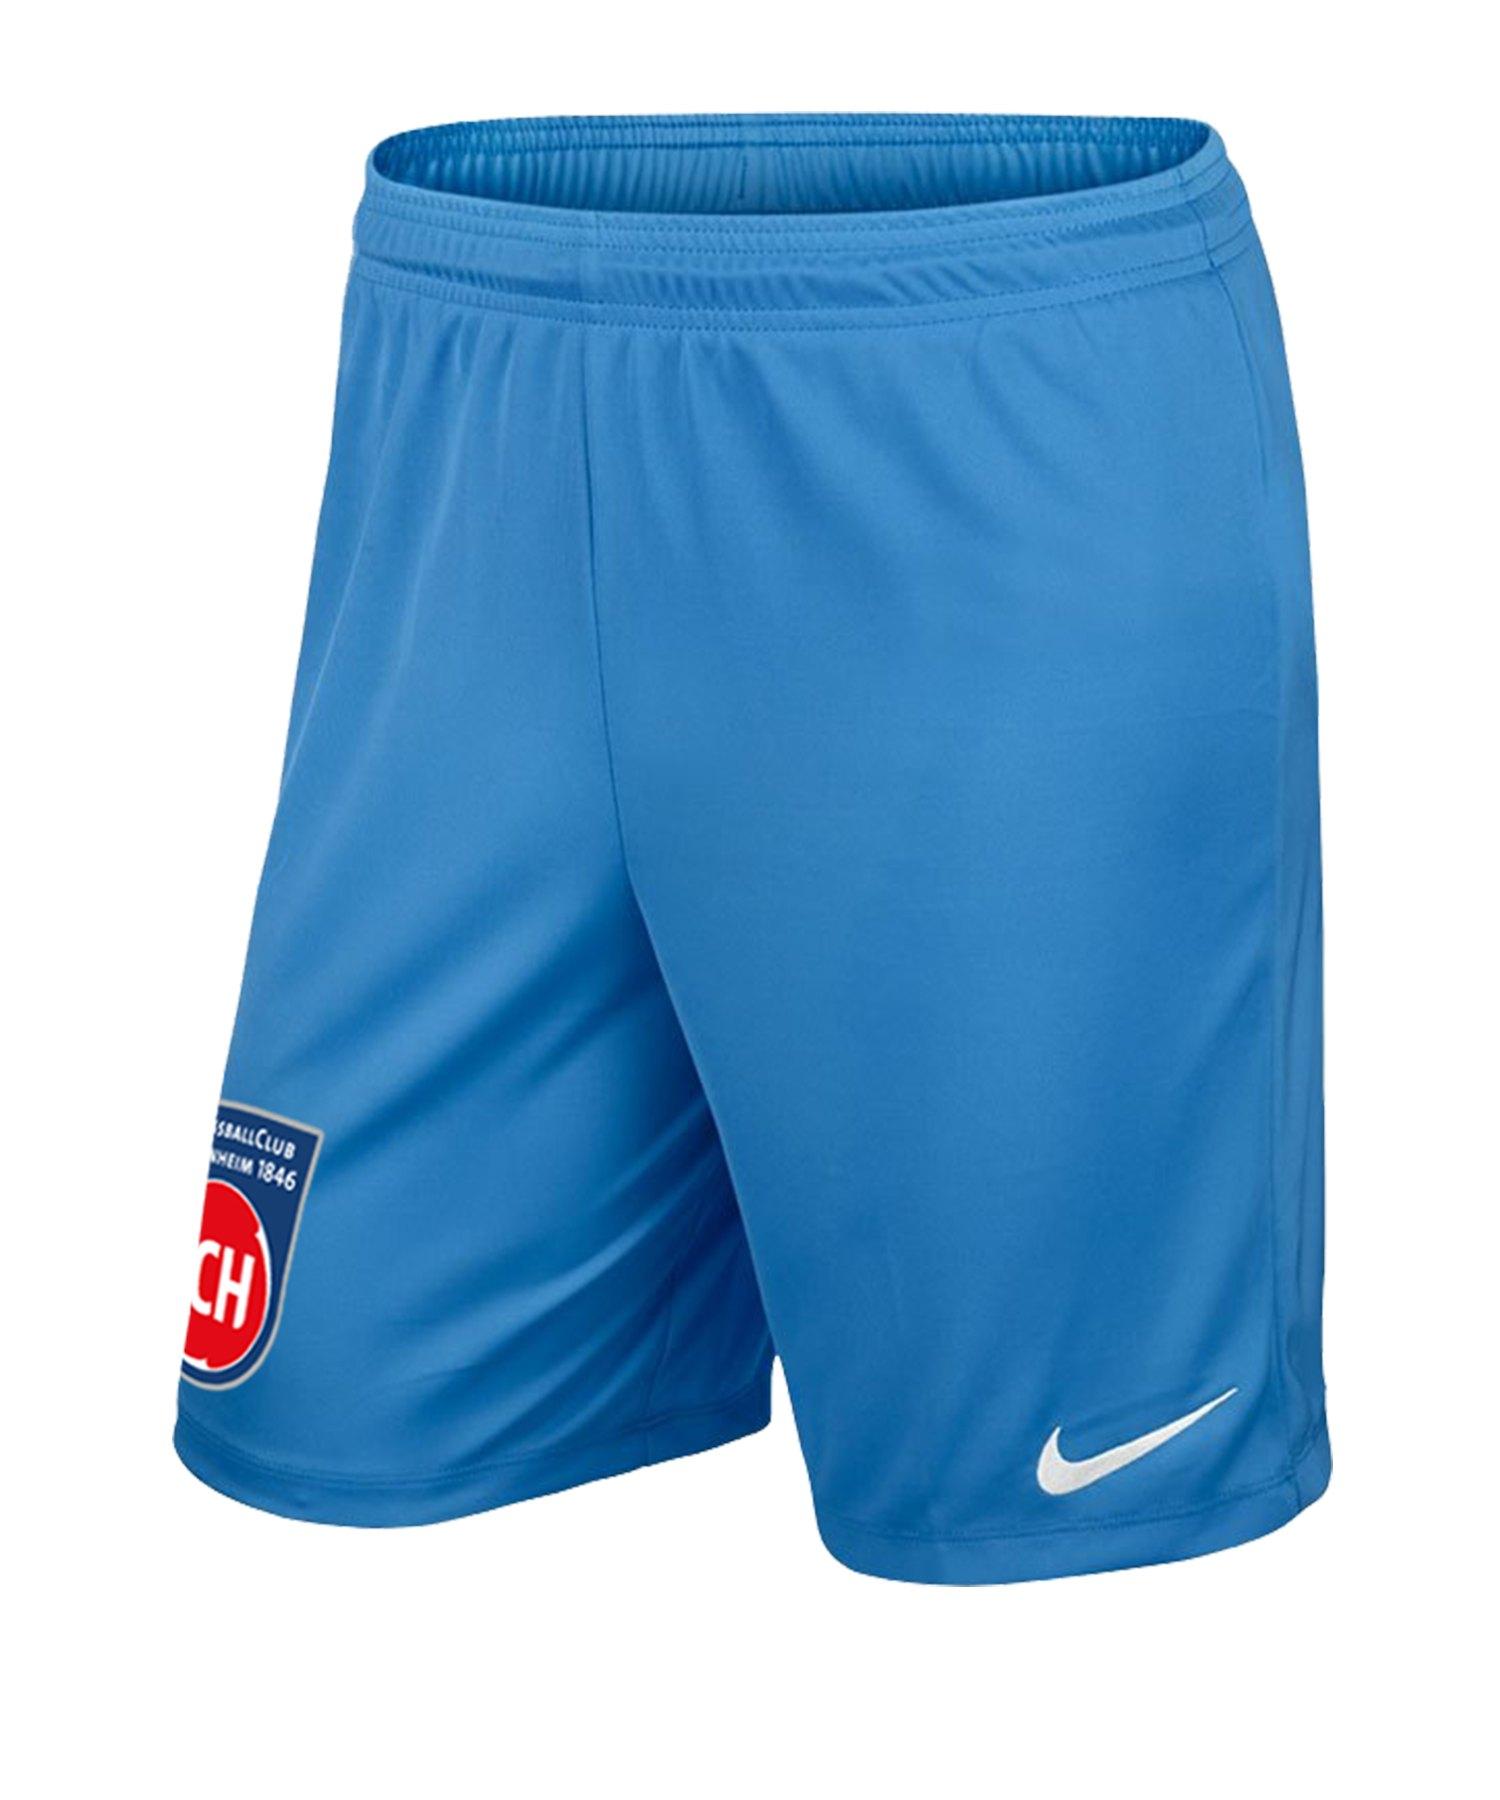 Nike 1. FC Heidenheim TW-Short 2019/2020 F412 - blau